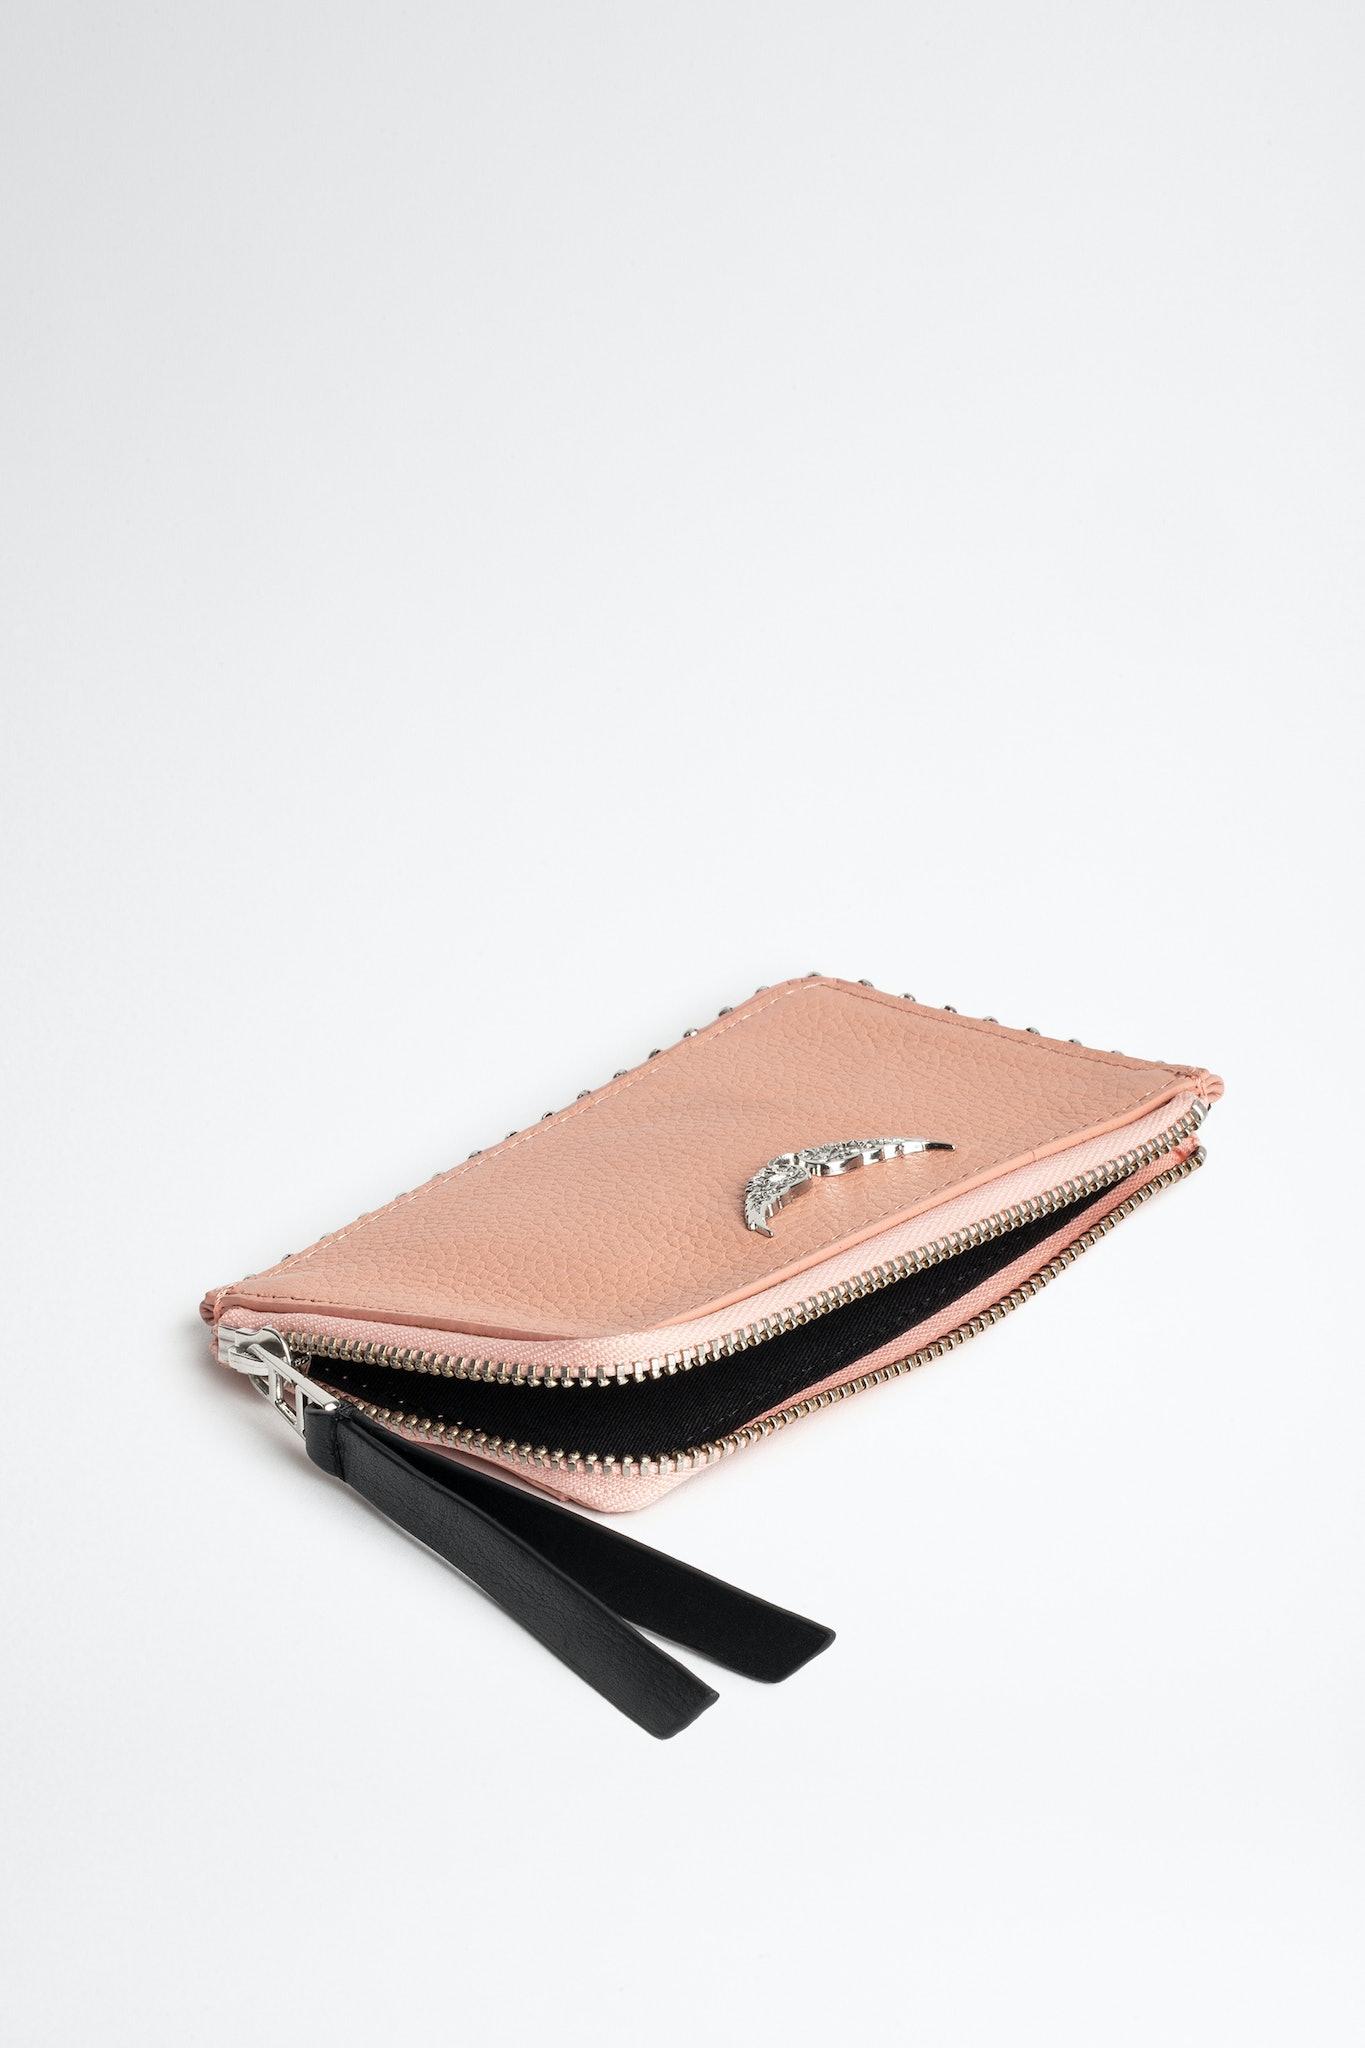 ZV Card Card Holder